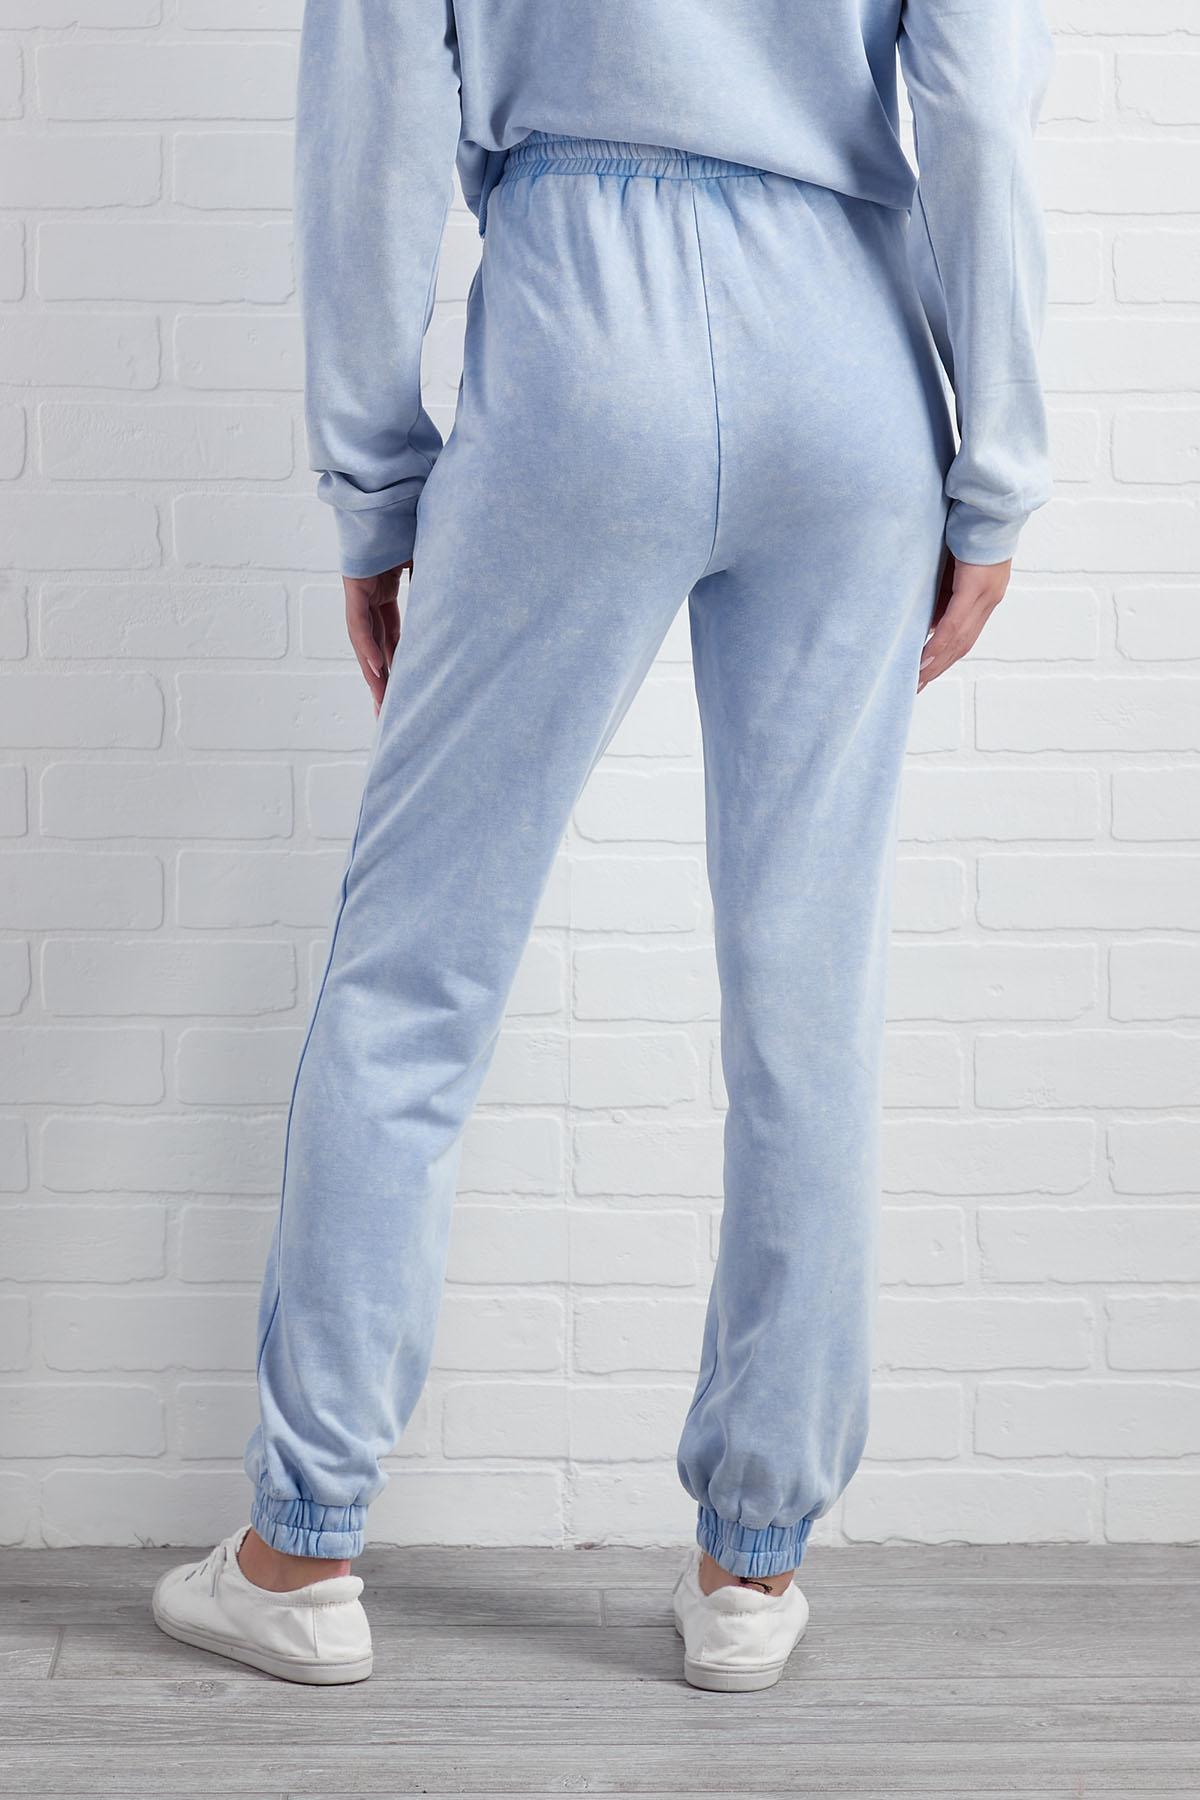 Winter Chill Pants